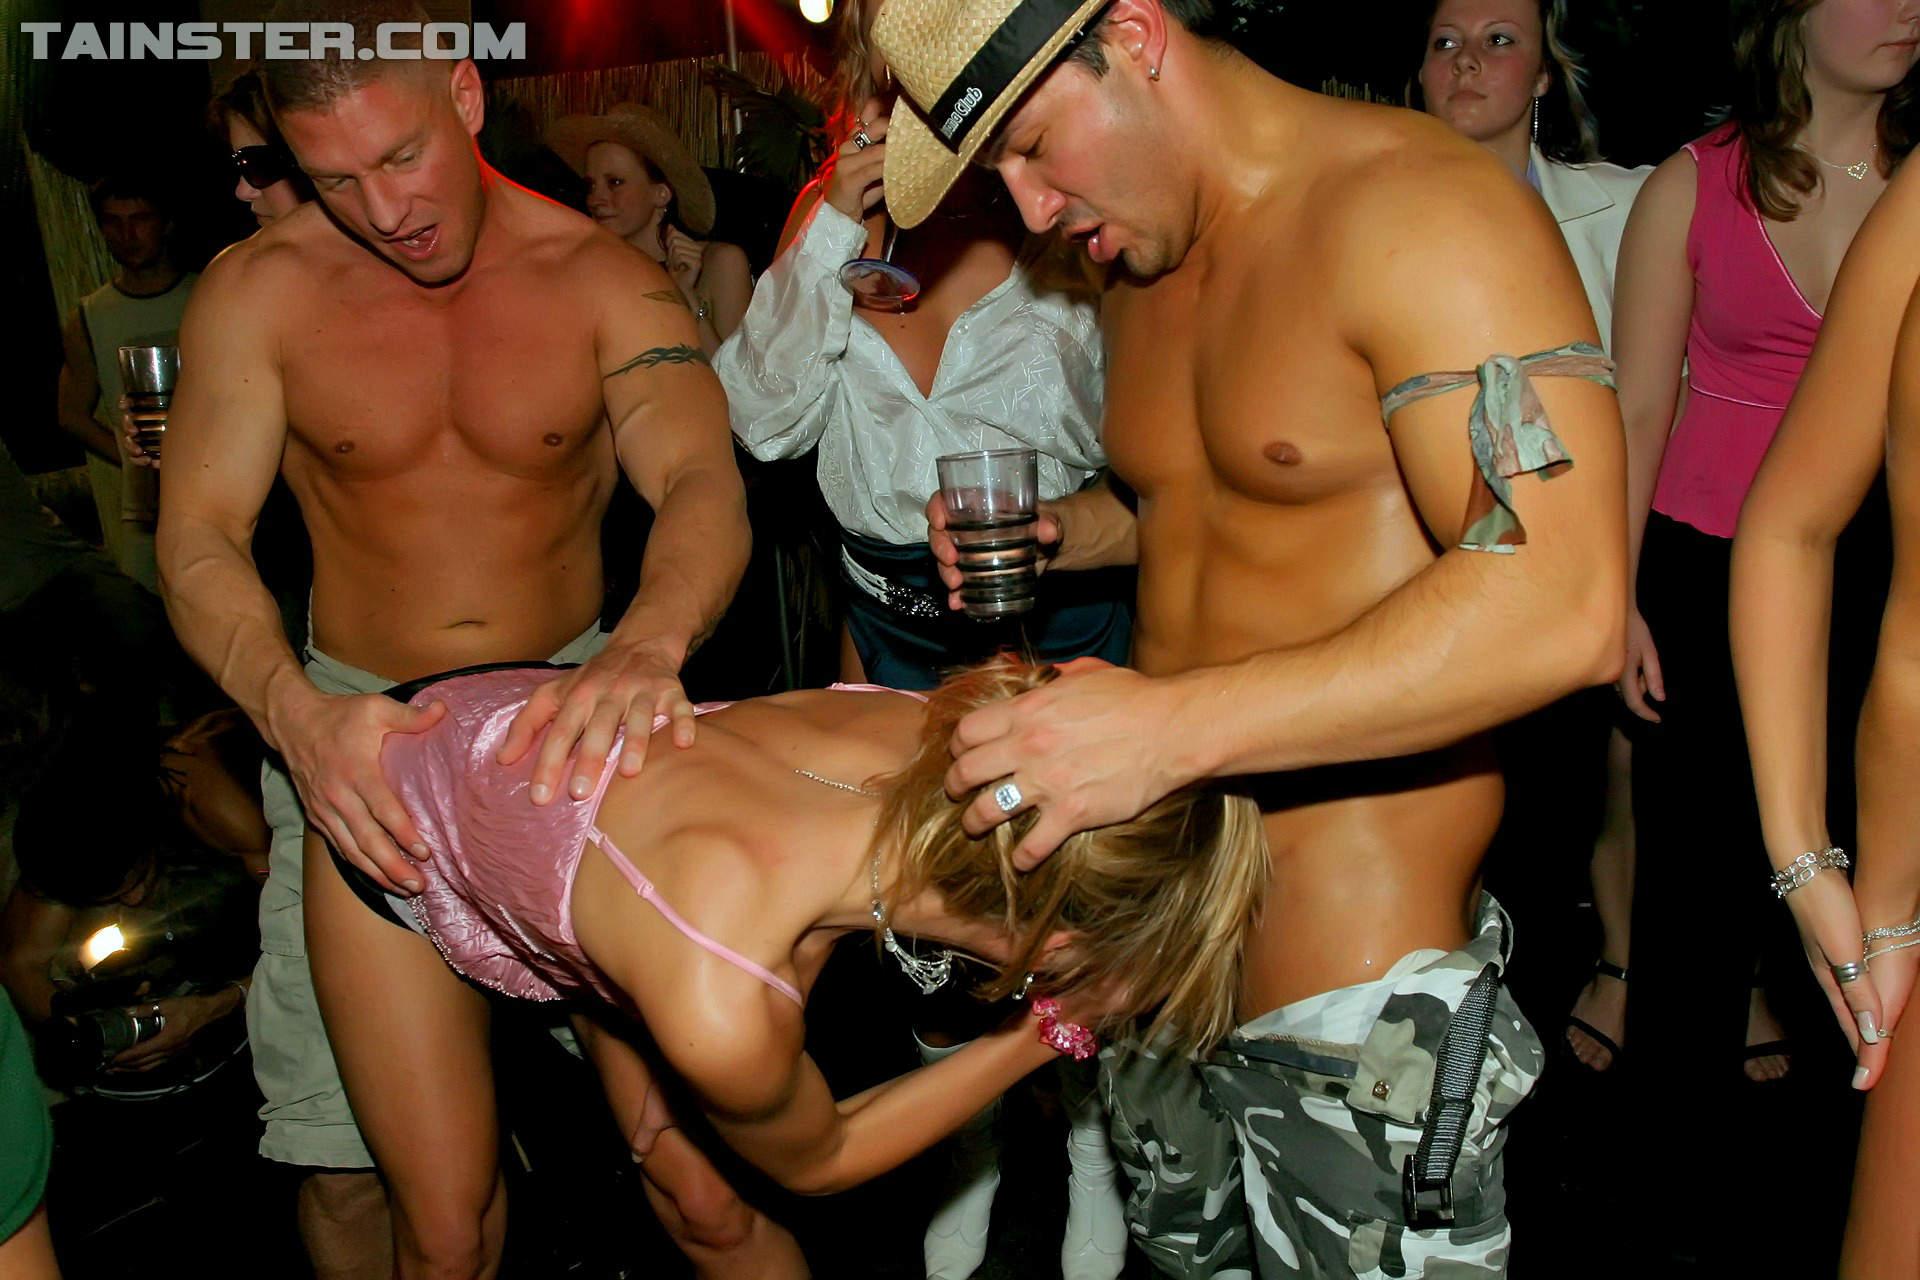 Фото секс с вечеринок, Секс вечеринки - порно фото и видео 15 фотография